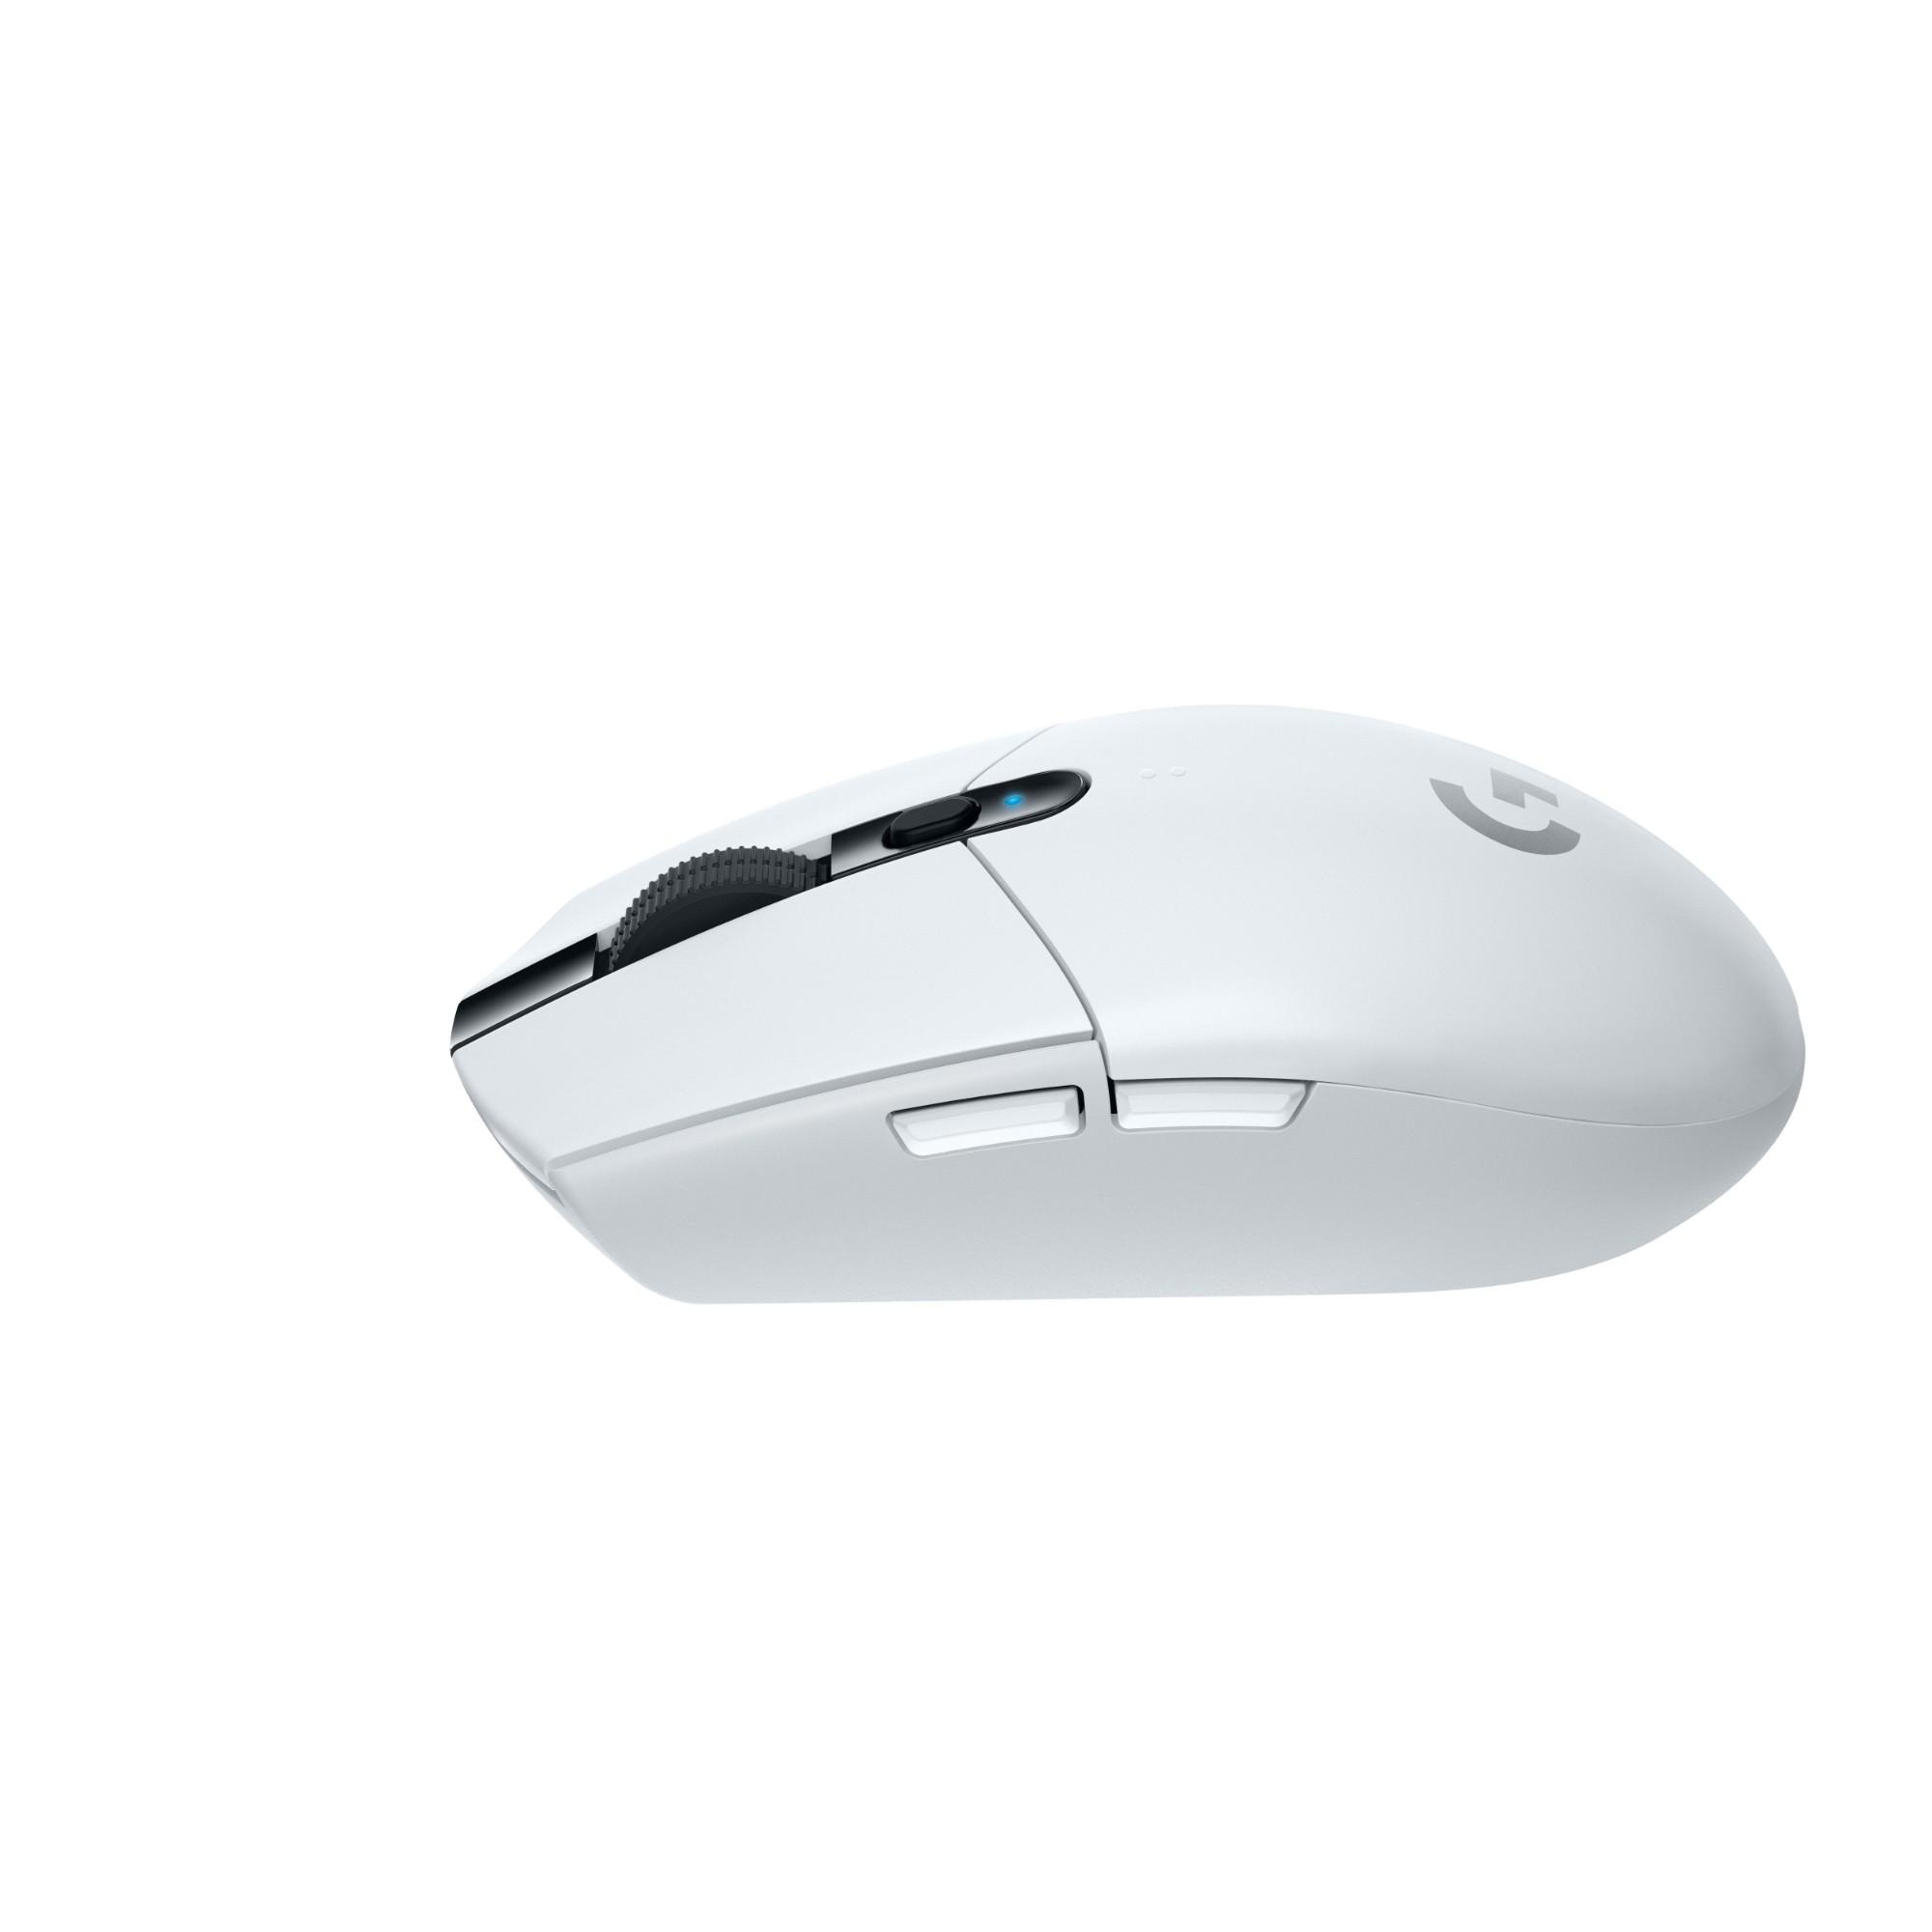 Logitech G G305 ratón RF inalámbrico Óptico 12000 DPI mano derecha